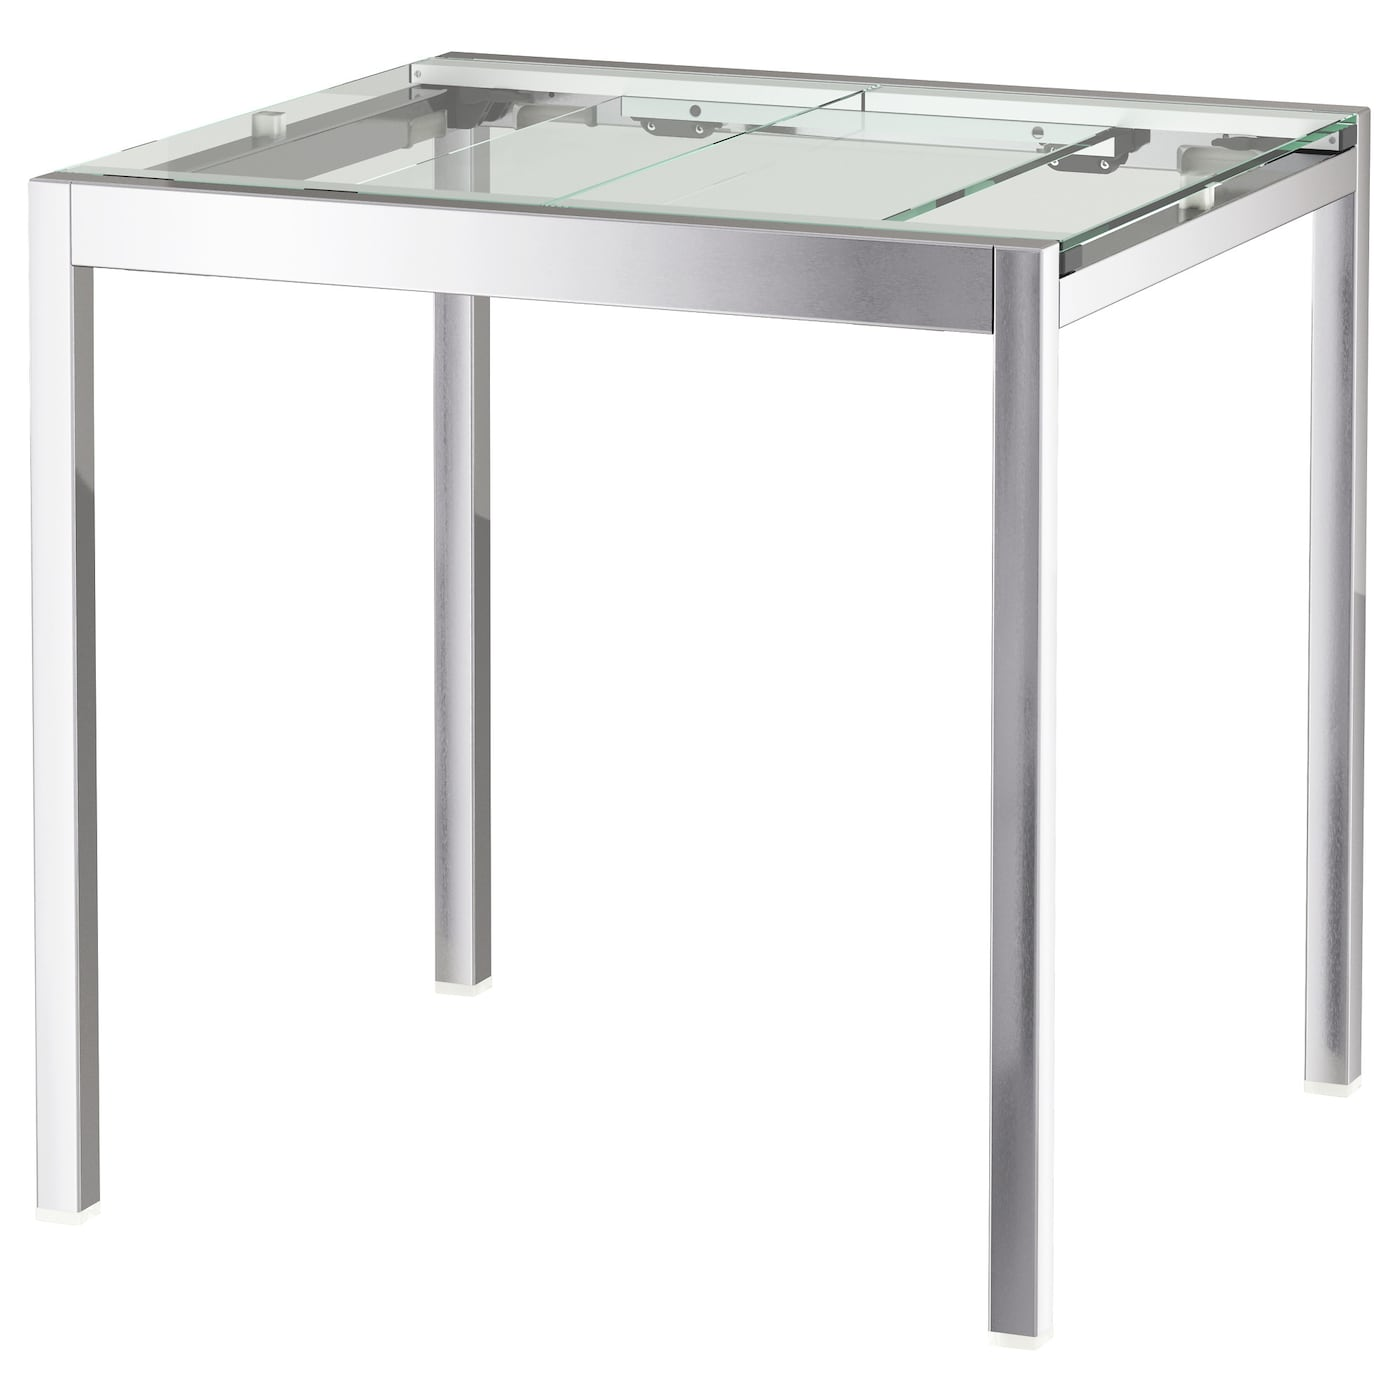 GLIVARP Mesa extensible Transparente/cromado 75/115 x 70 cm - IKEA